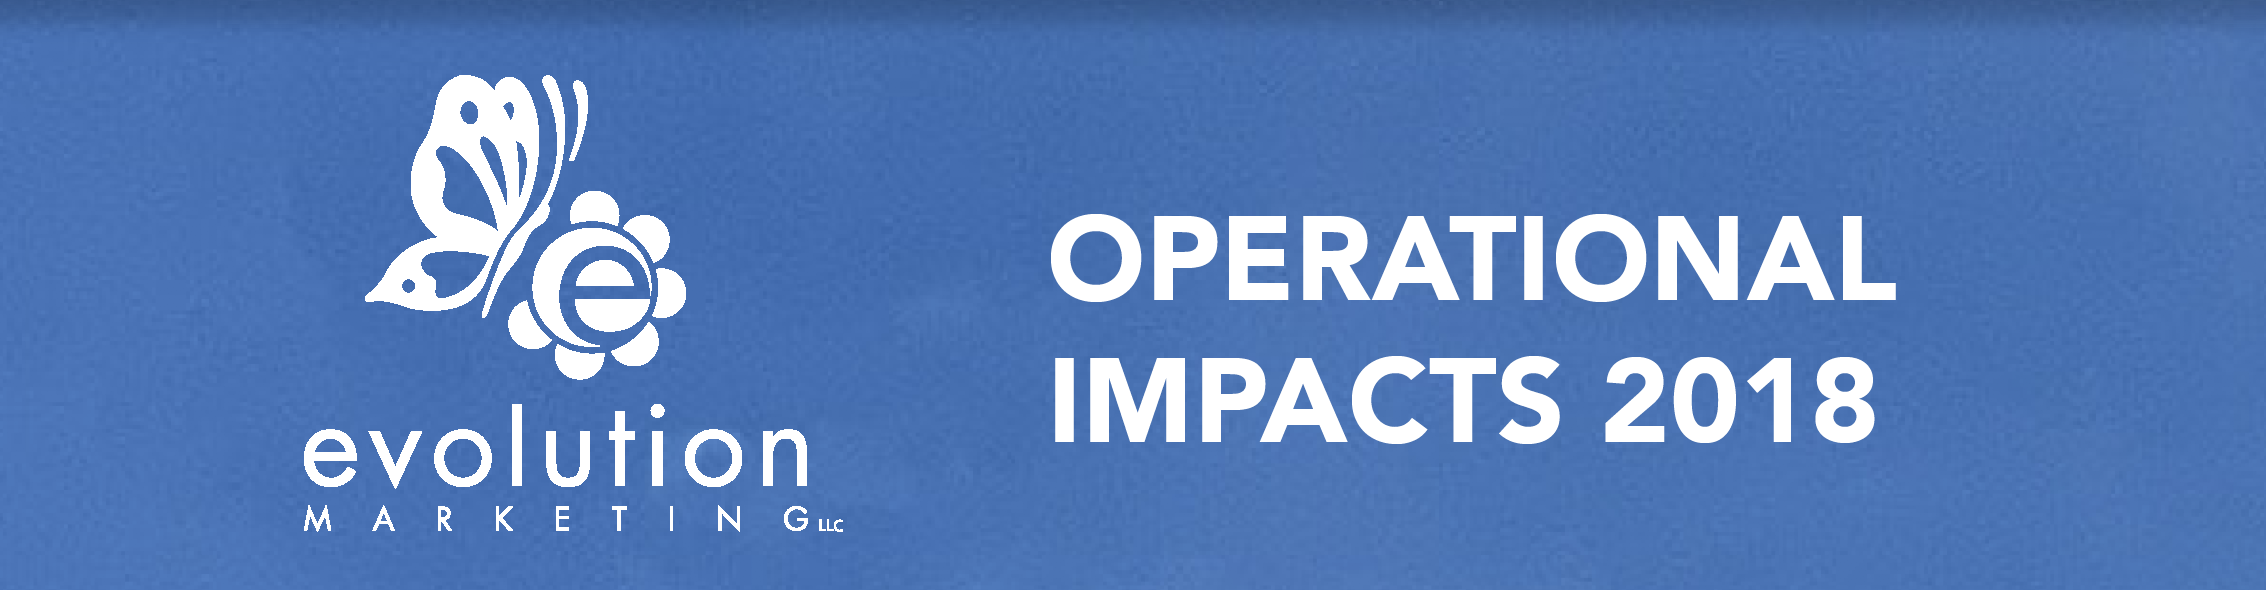 Operational impact report 2018